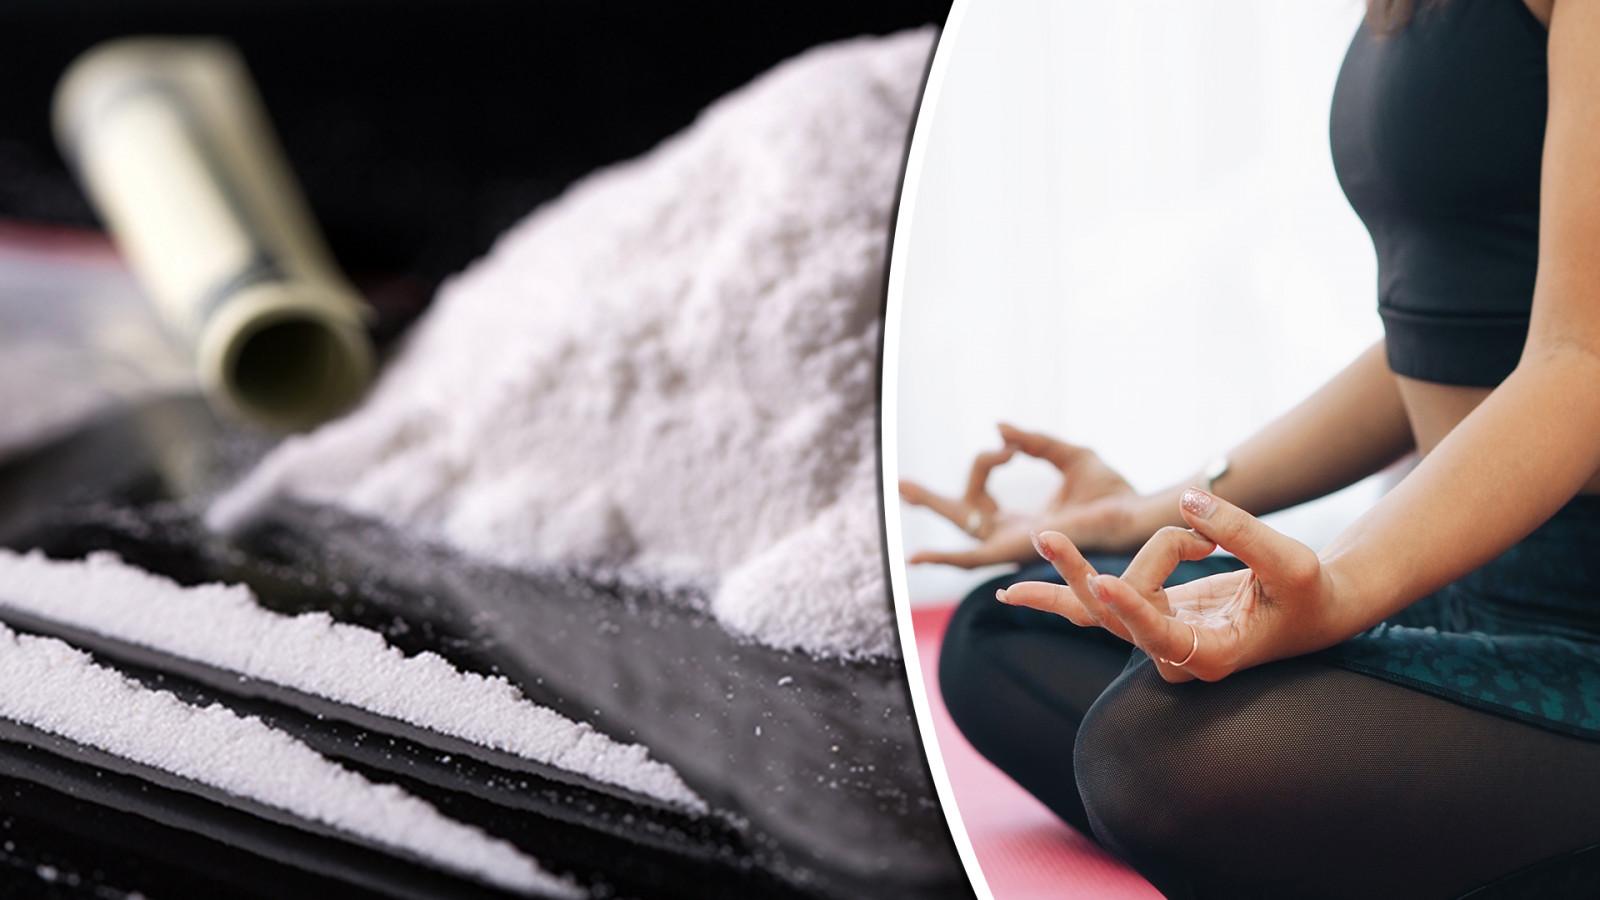 Afbeeldingsresultaat voor yogasnuivers